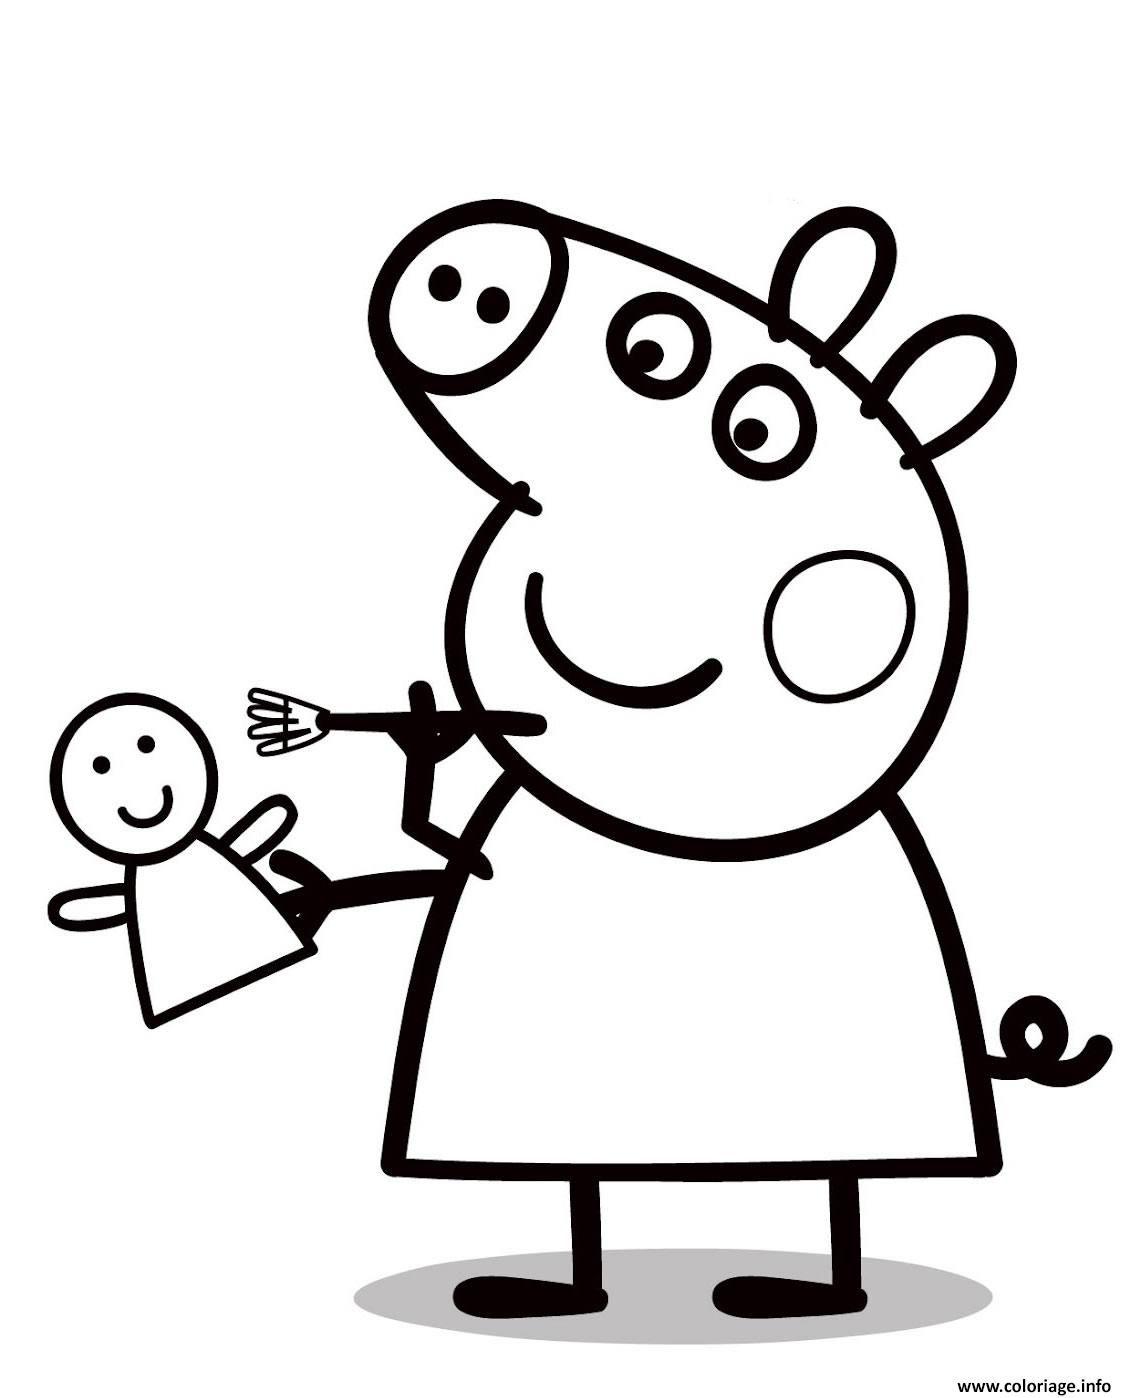 dessin peppa pig a colorier - Recherche Google | Peppa pig ...